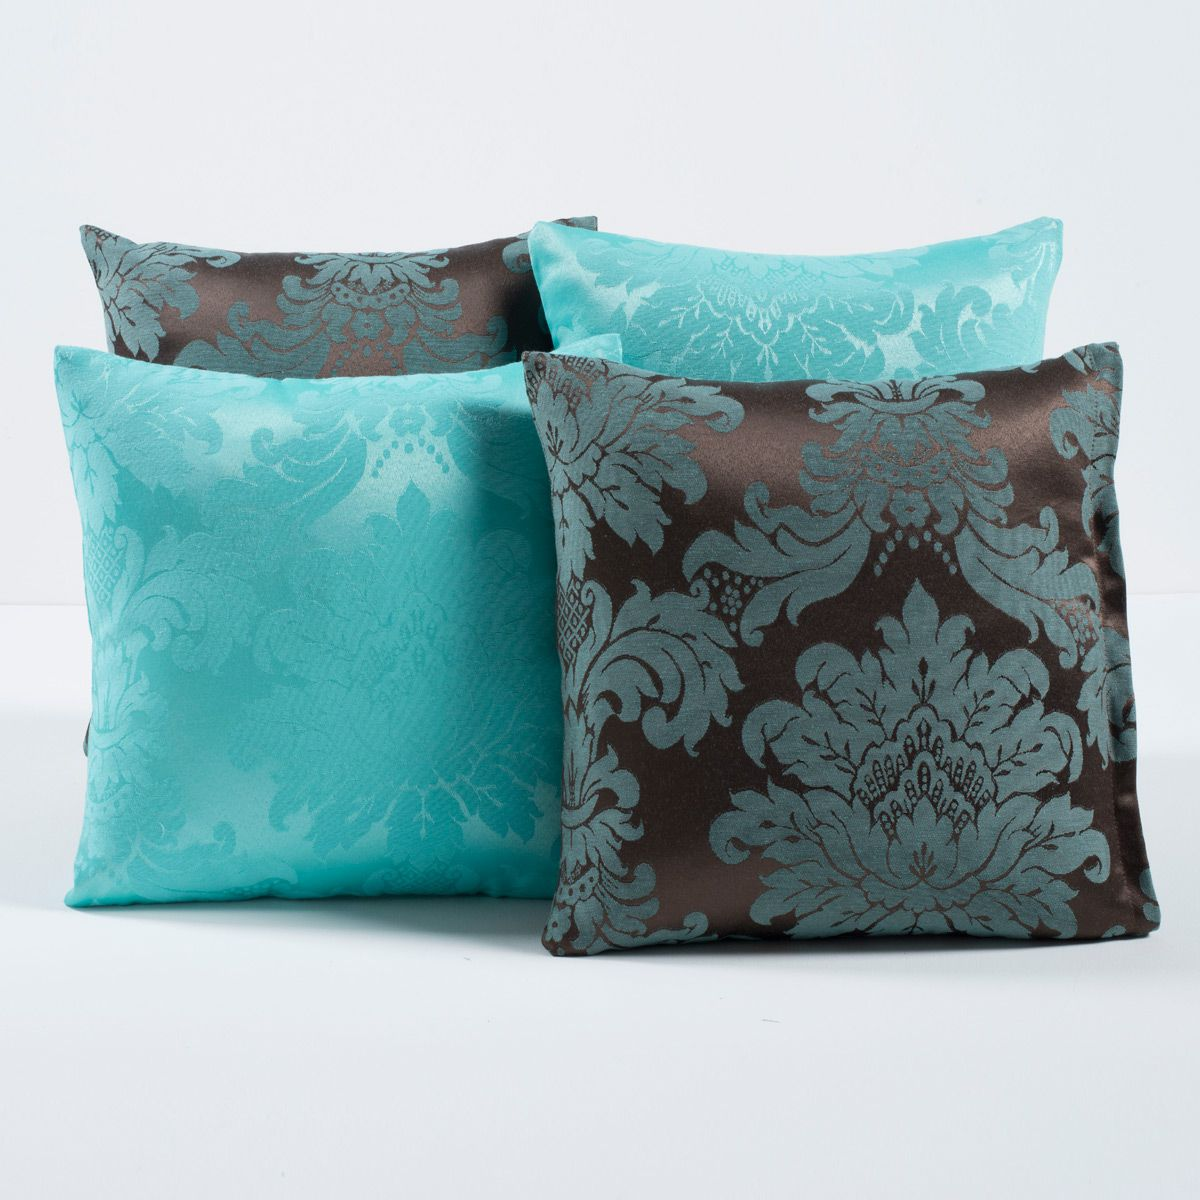 Kit Capas de Almofadas Decorativas Tiffany/Tabaco 04 Peças